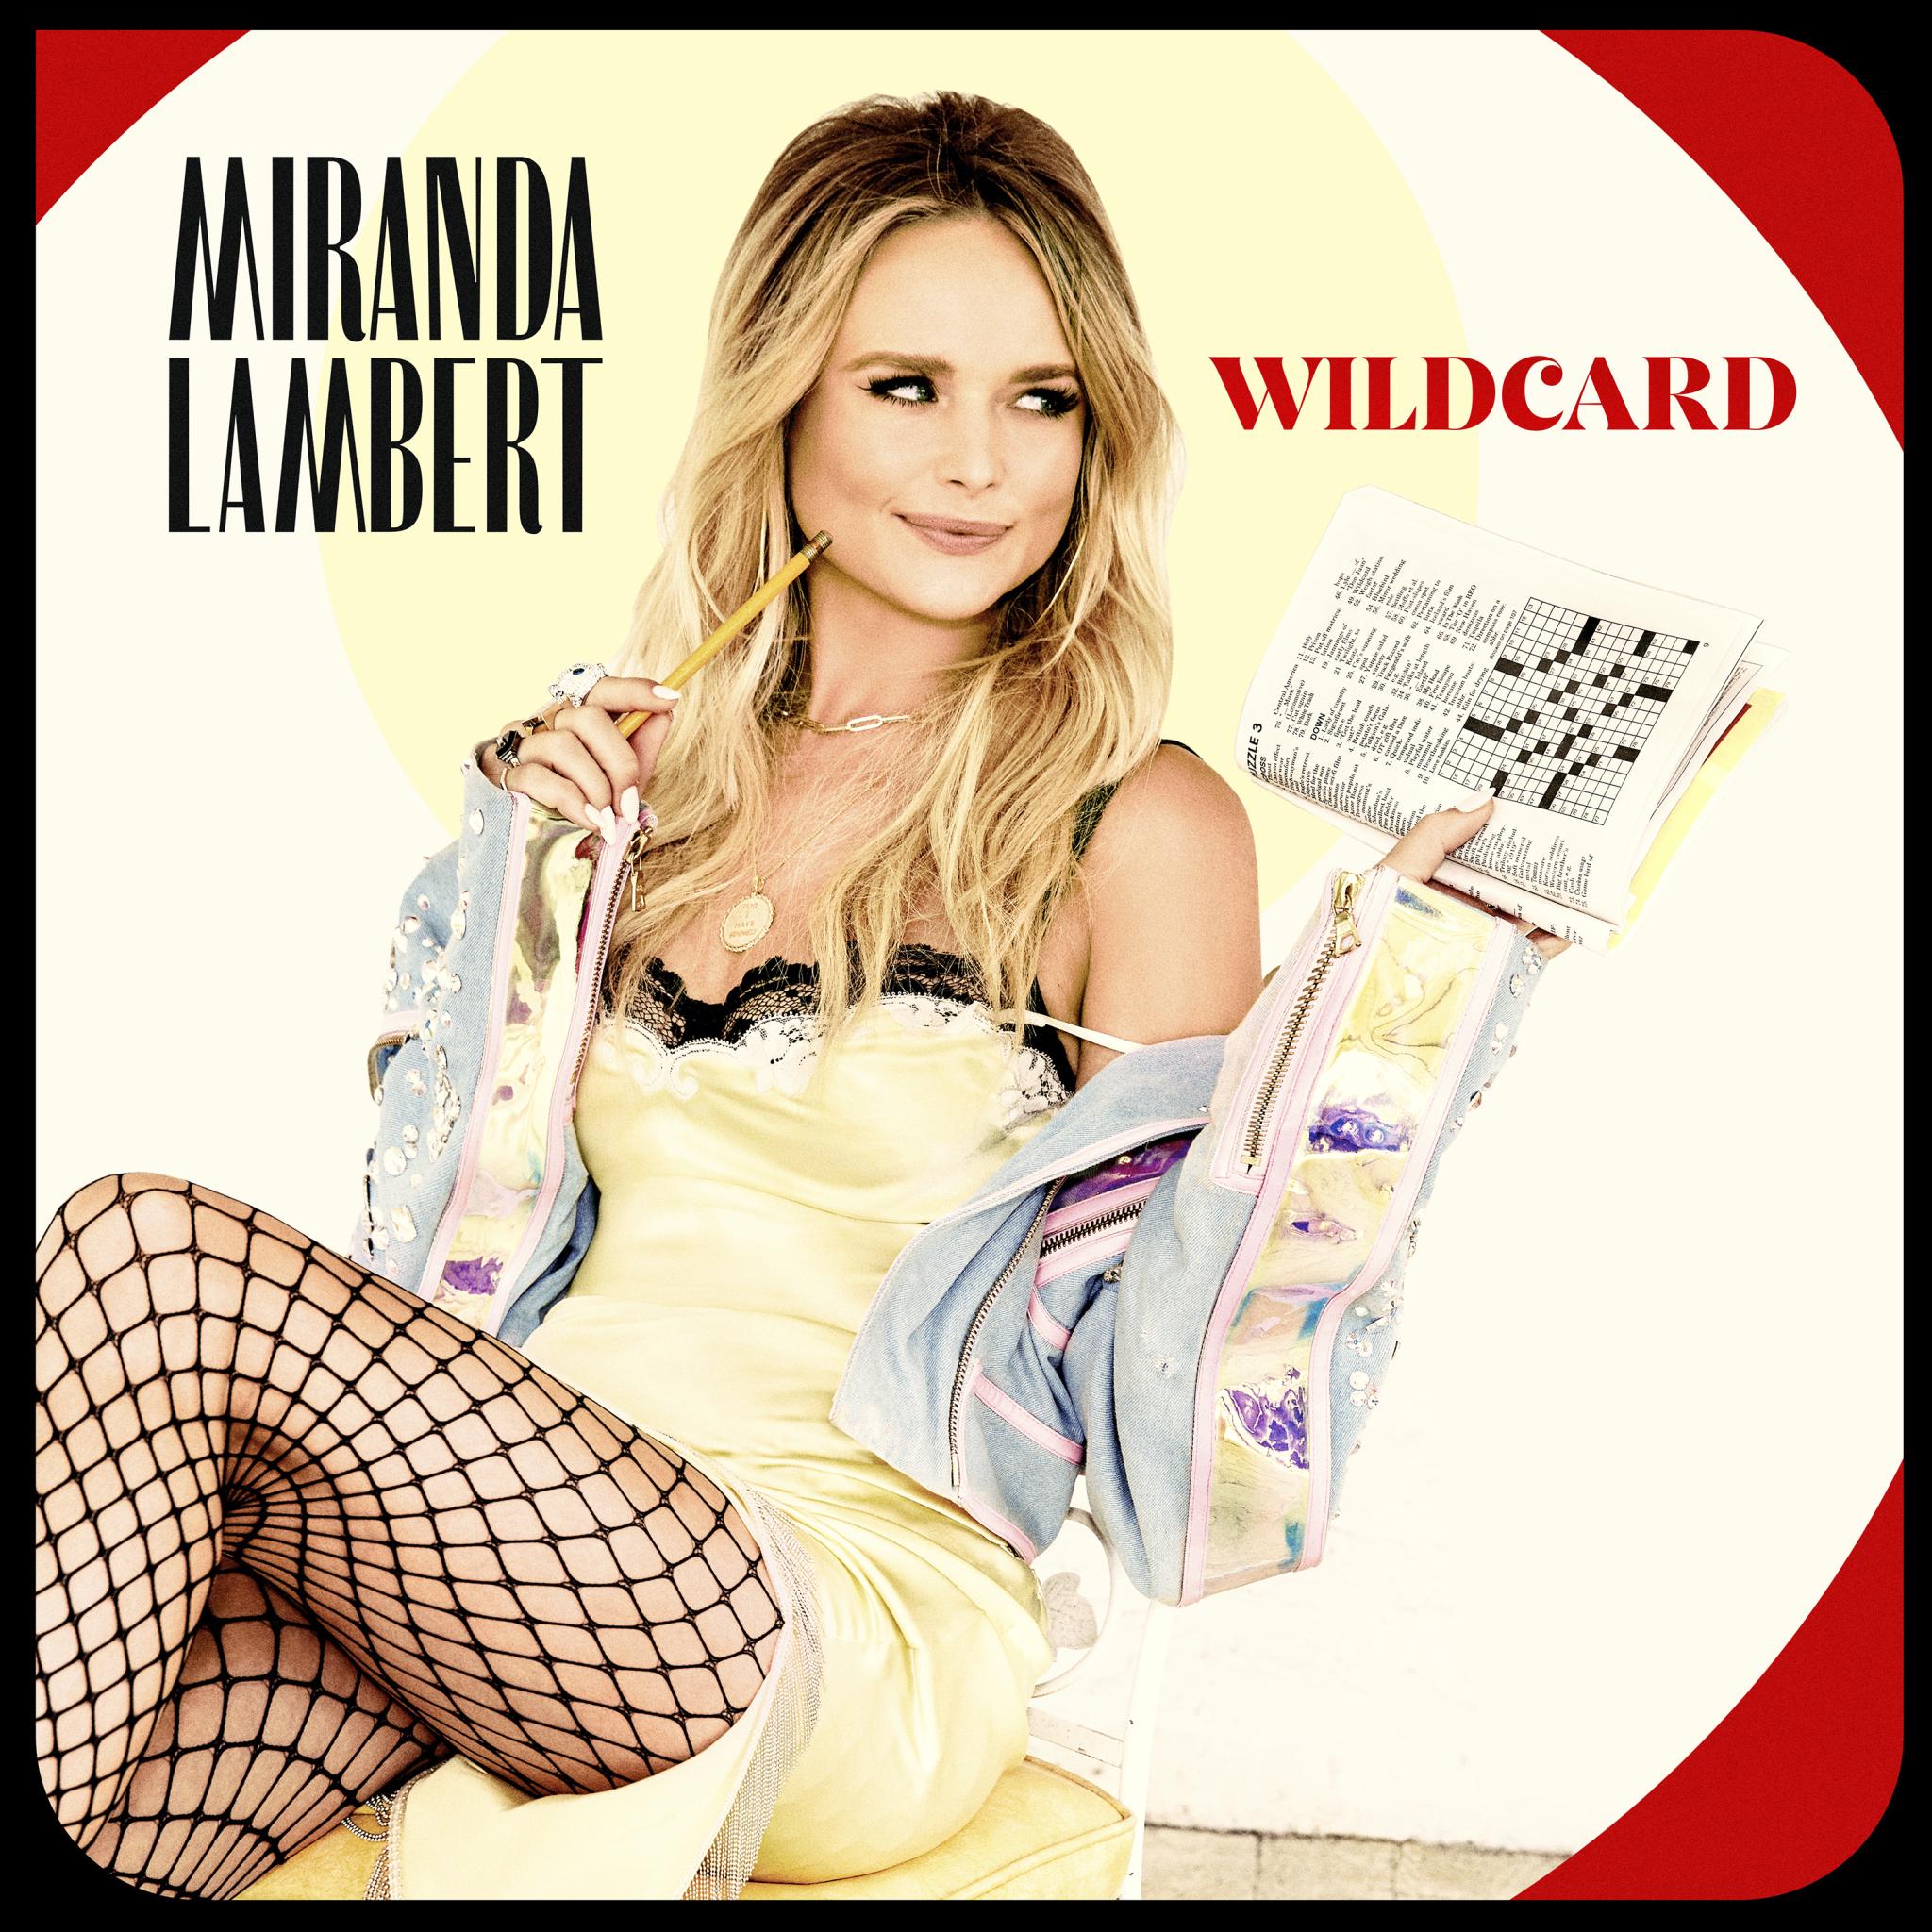 Miranda-Lambert-Wildcard-Announcement.jpg